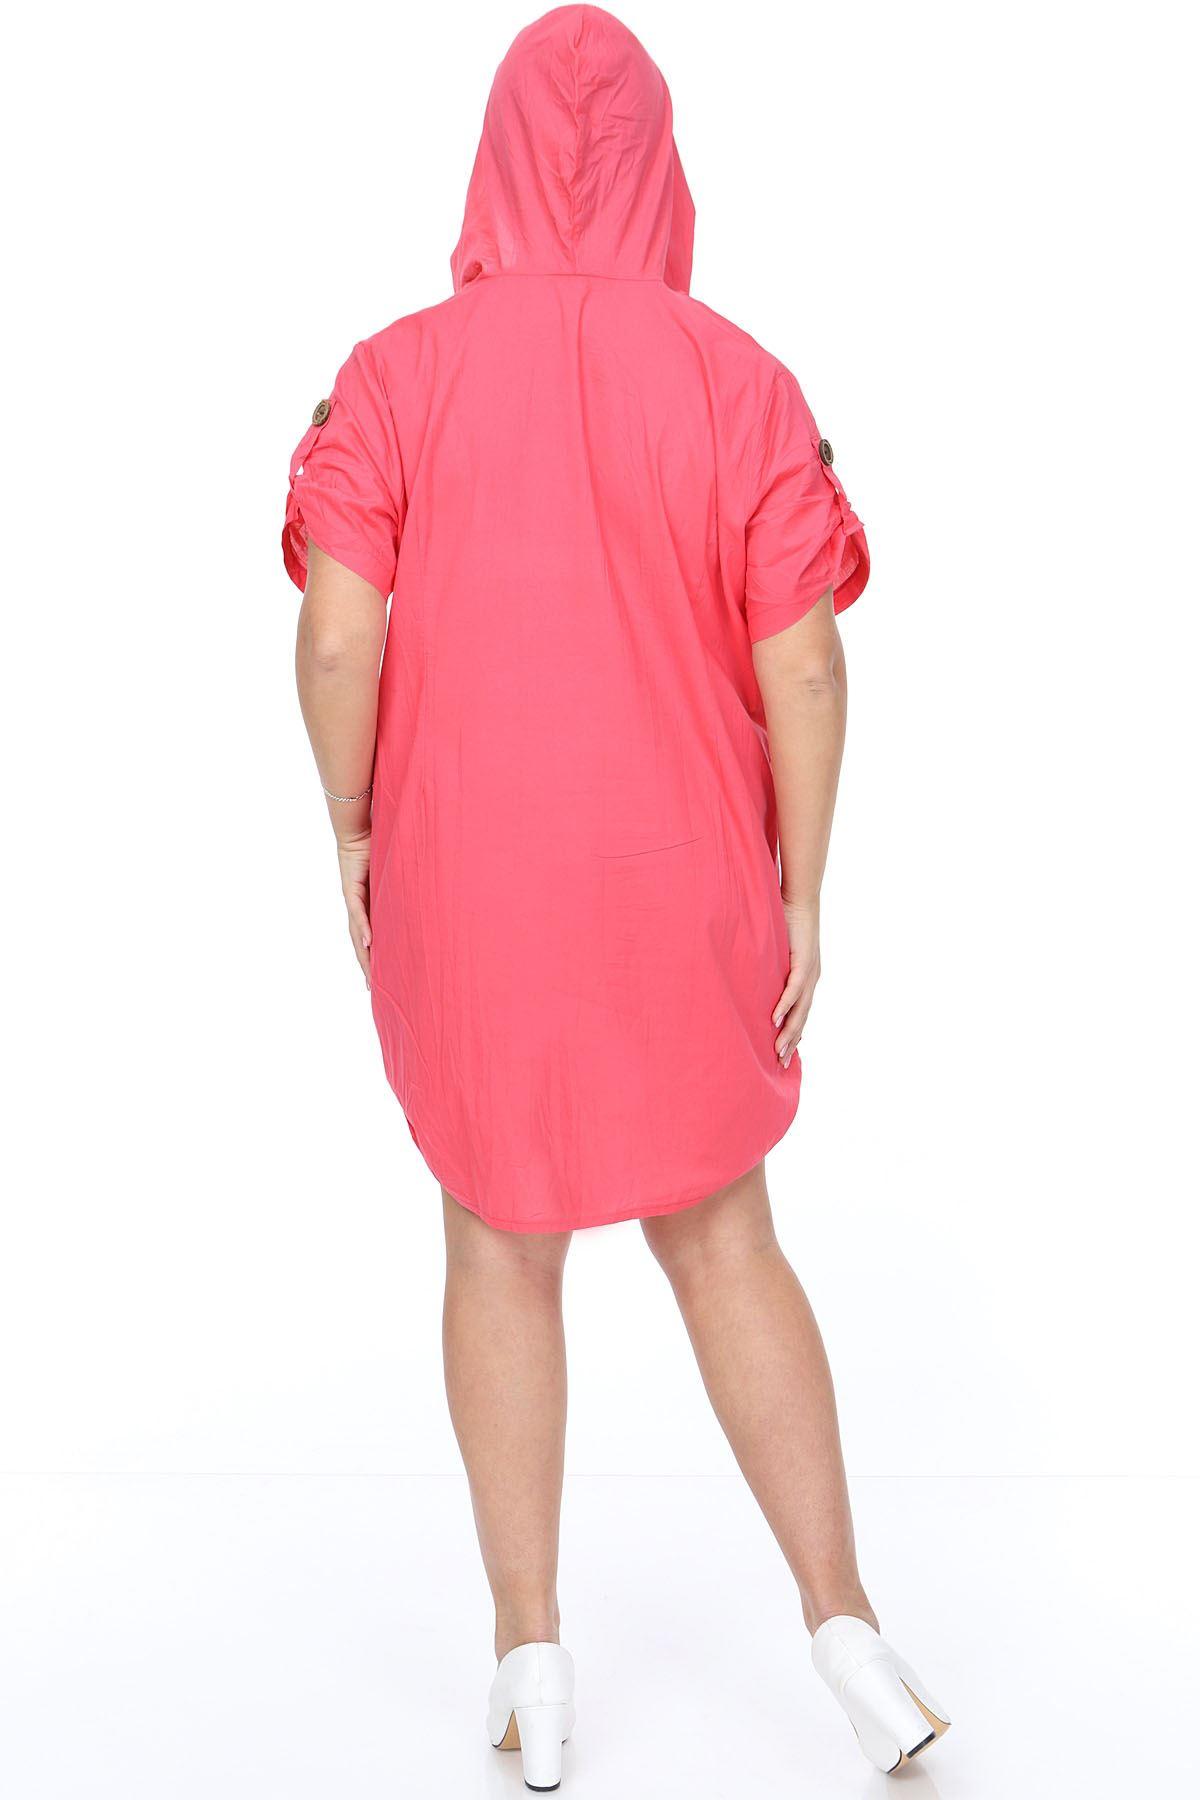 Pembe Gömlek Elbise 15F-0903